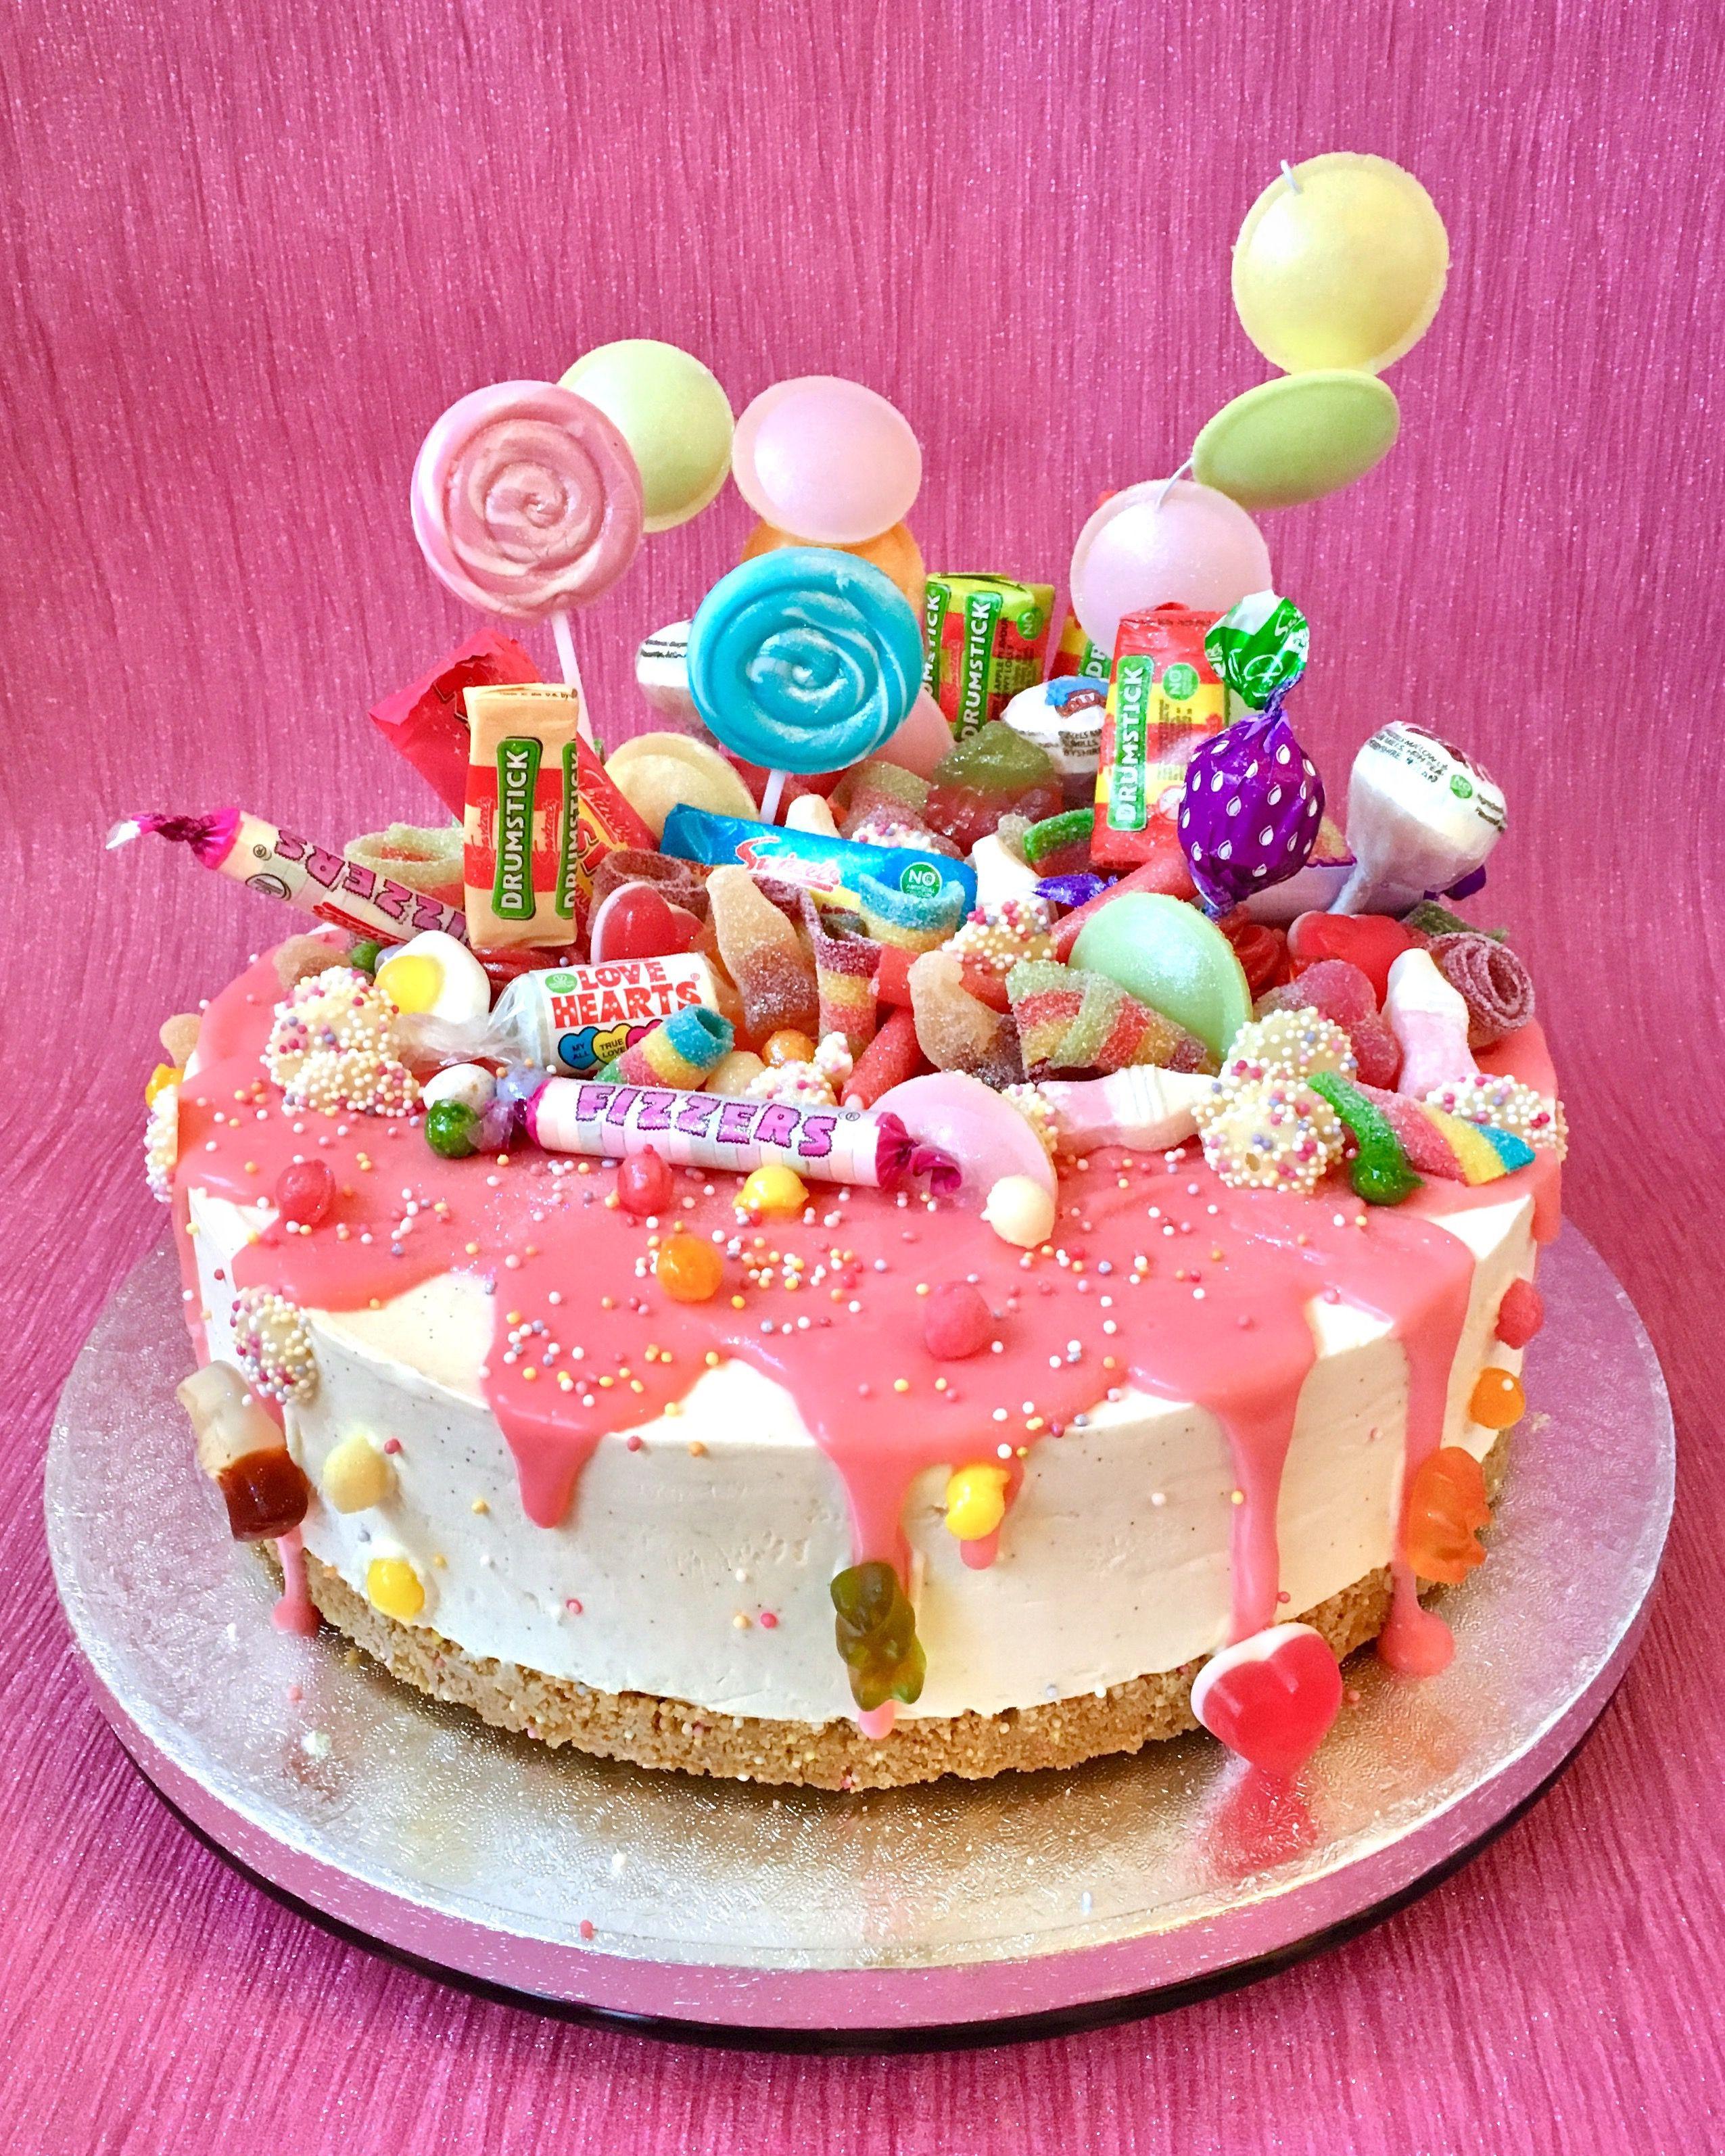 Amazing Swizzels Haribo Sweety Vanilla Cheesecake With Pink Chocolate Personalised Birthday Cards Petedlily Jamesorg